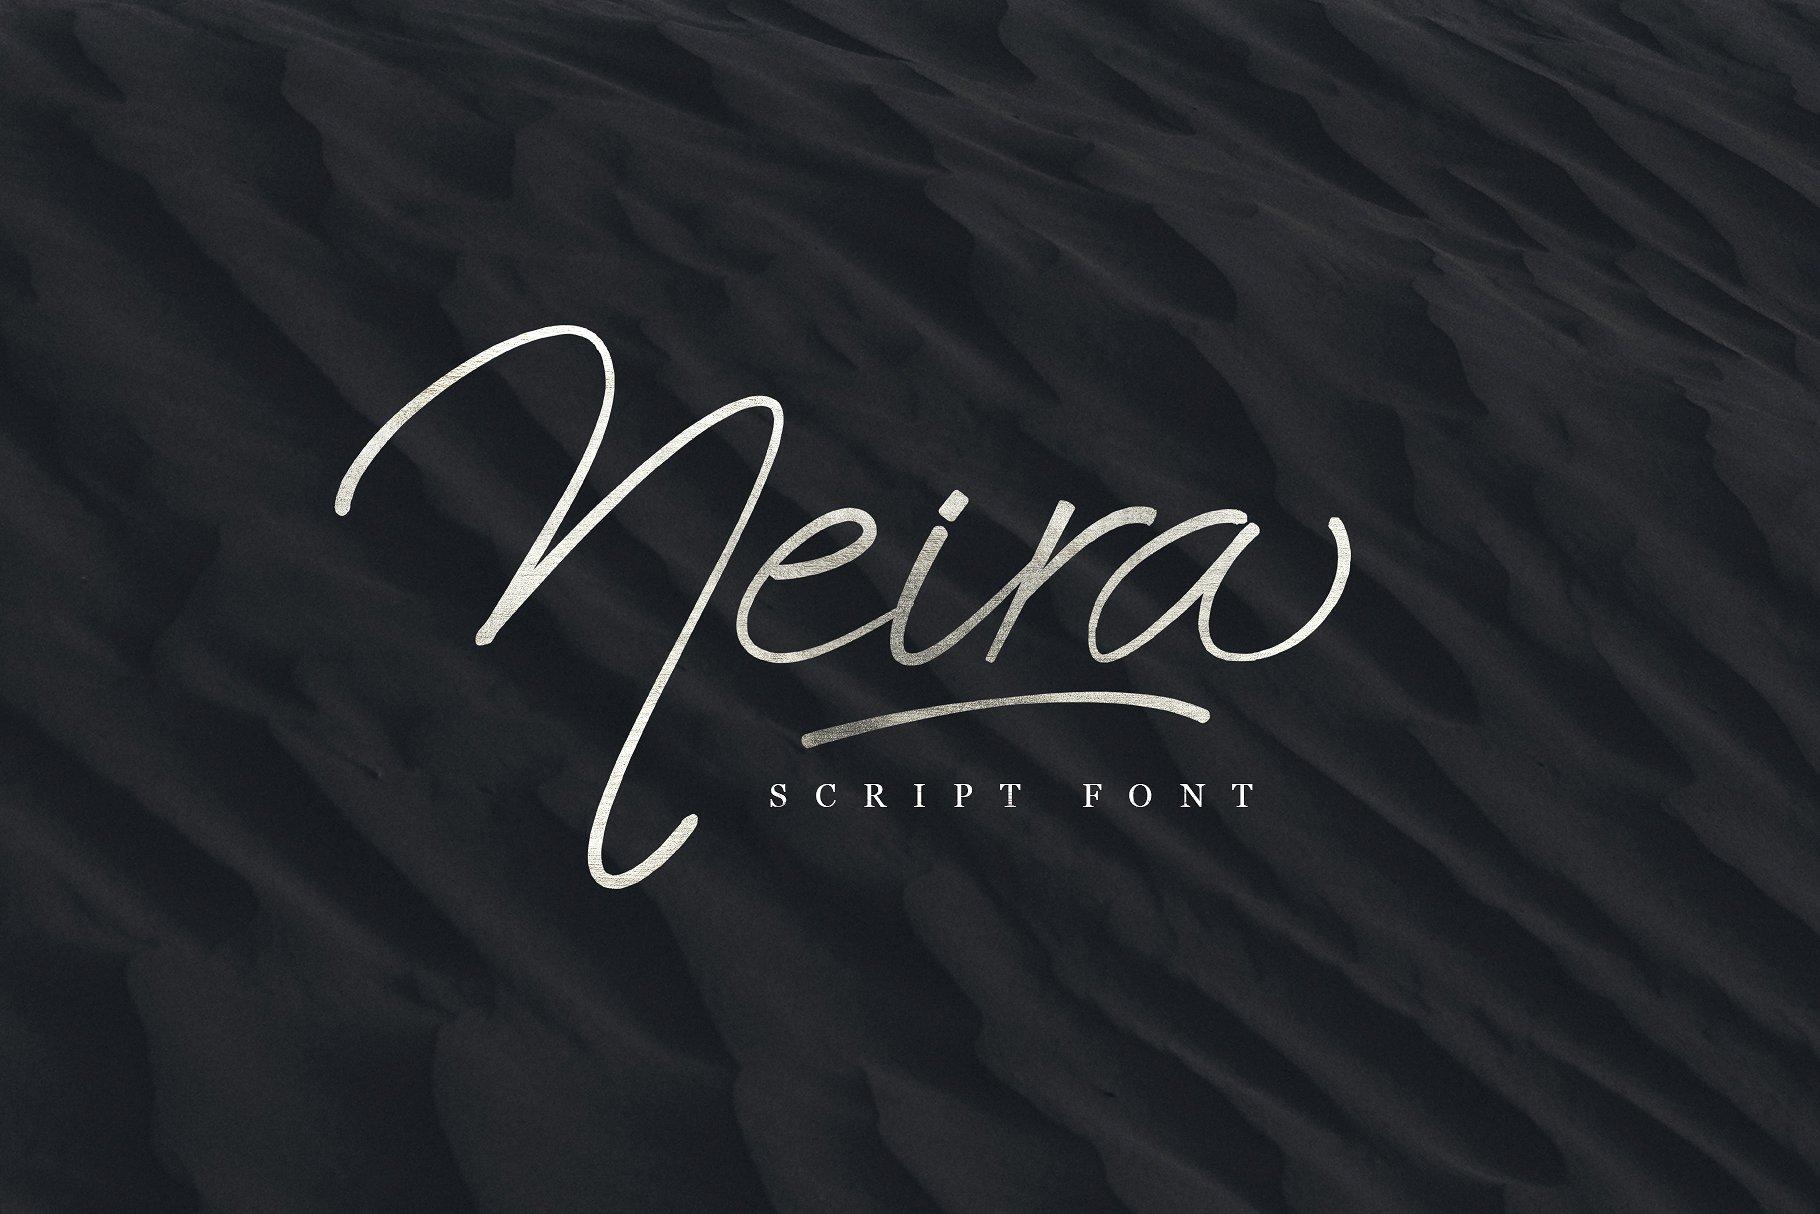 Neira手写文艺艺术签名英文字体下载